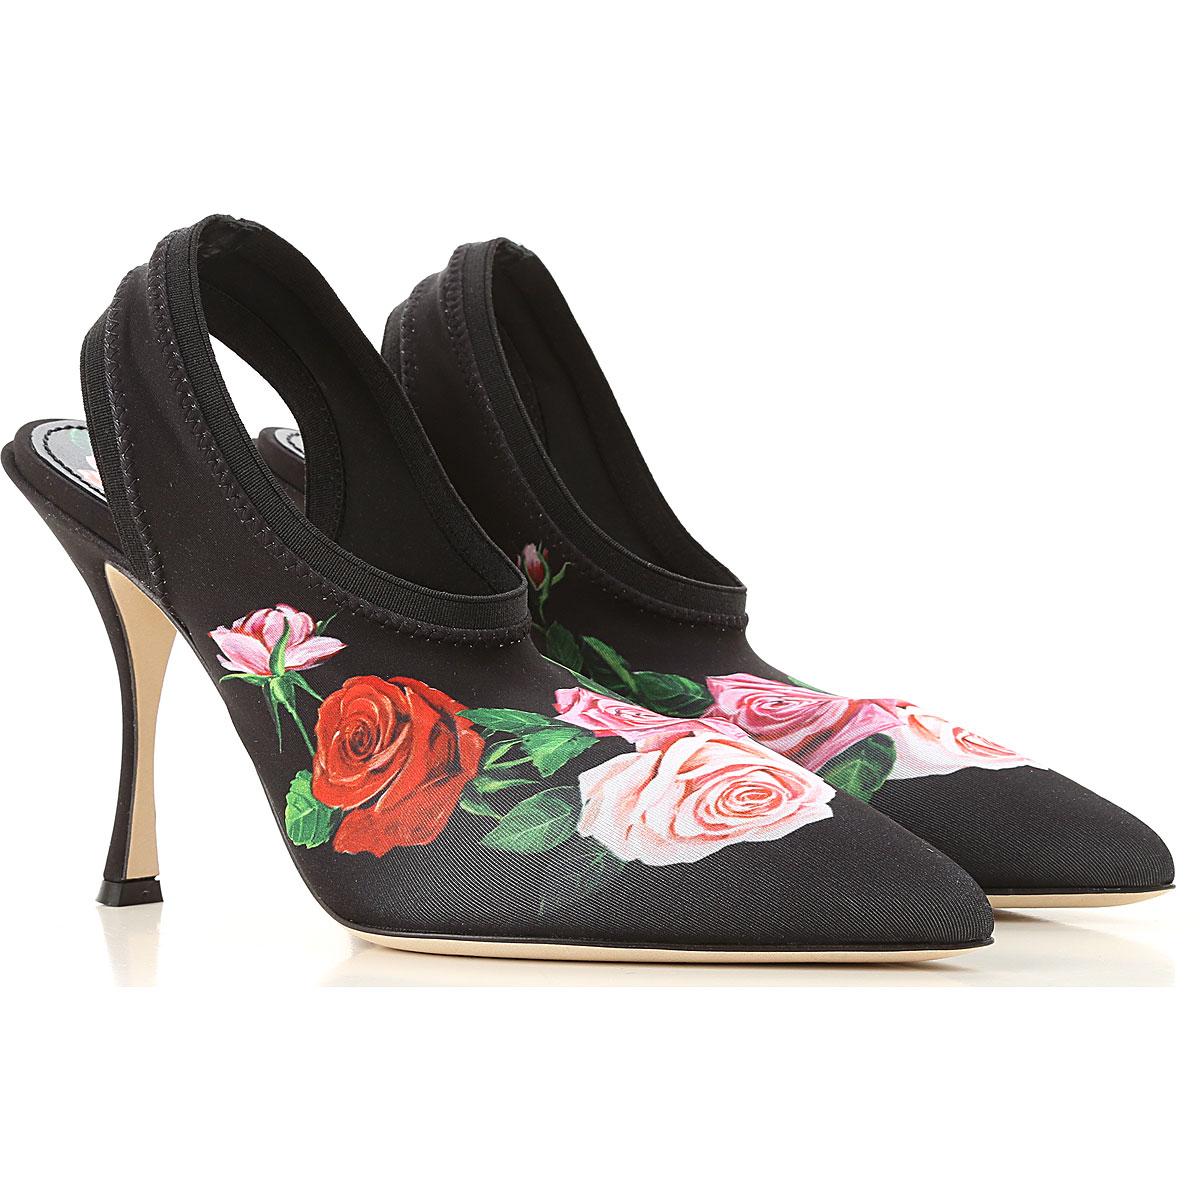 Dolce & Gabbana Pumps & High Heels moterims  in Outlet, juodi, Elastane, 2019, 36 37.5 39